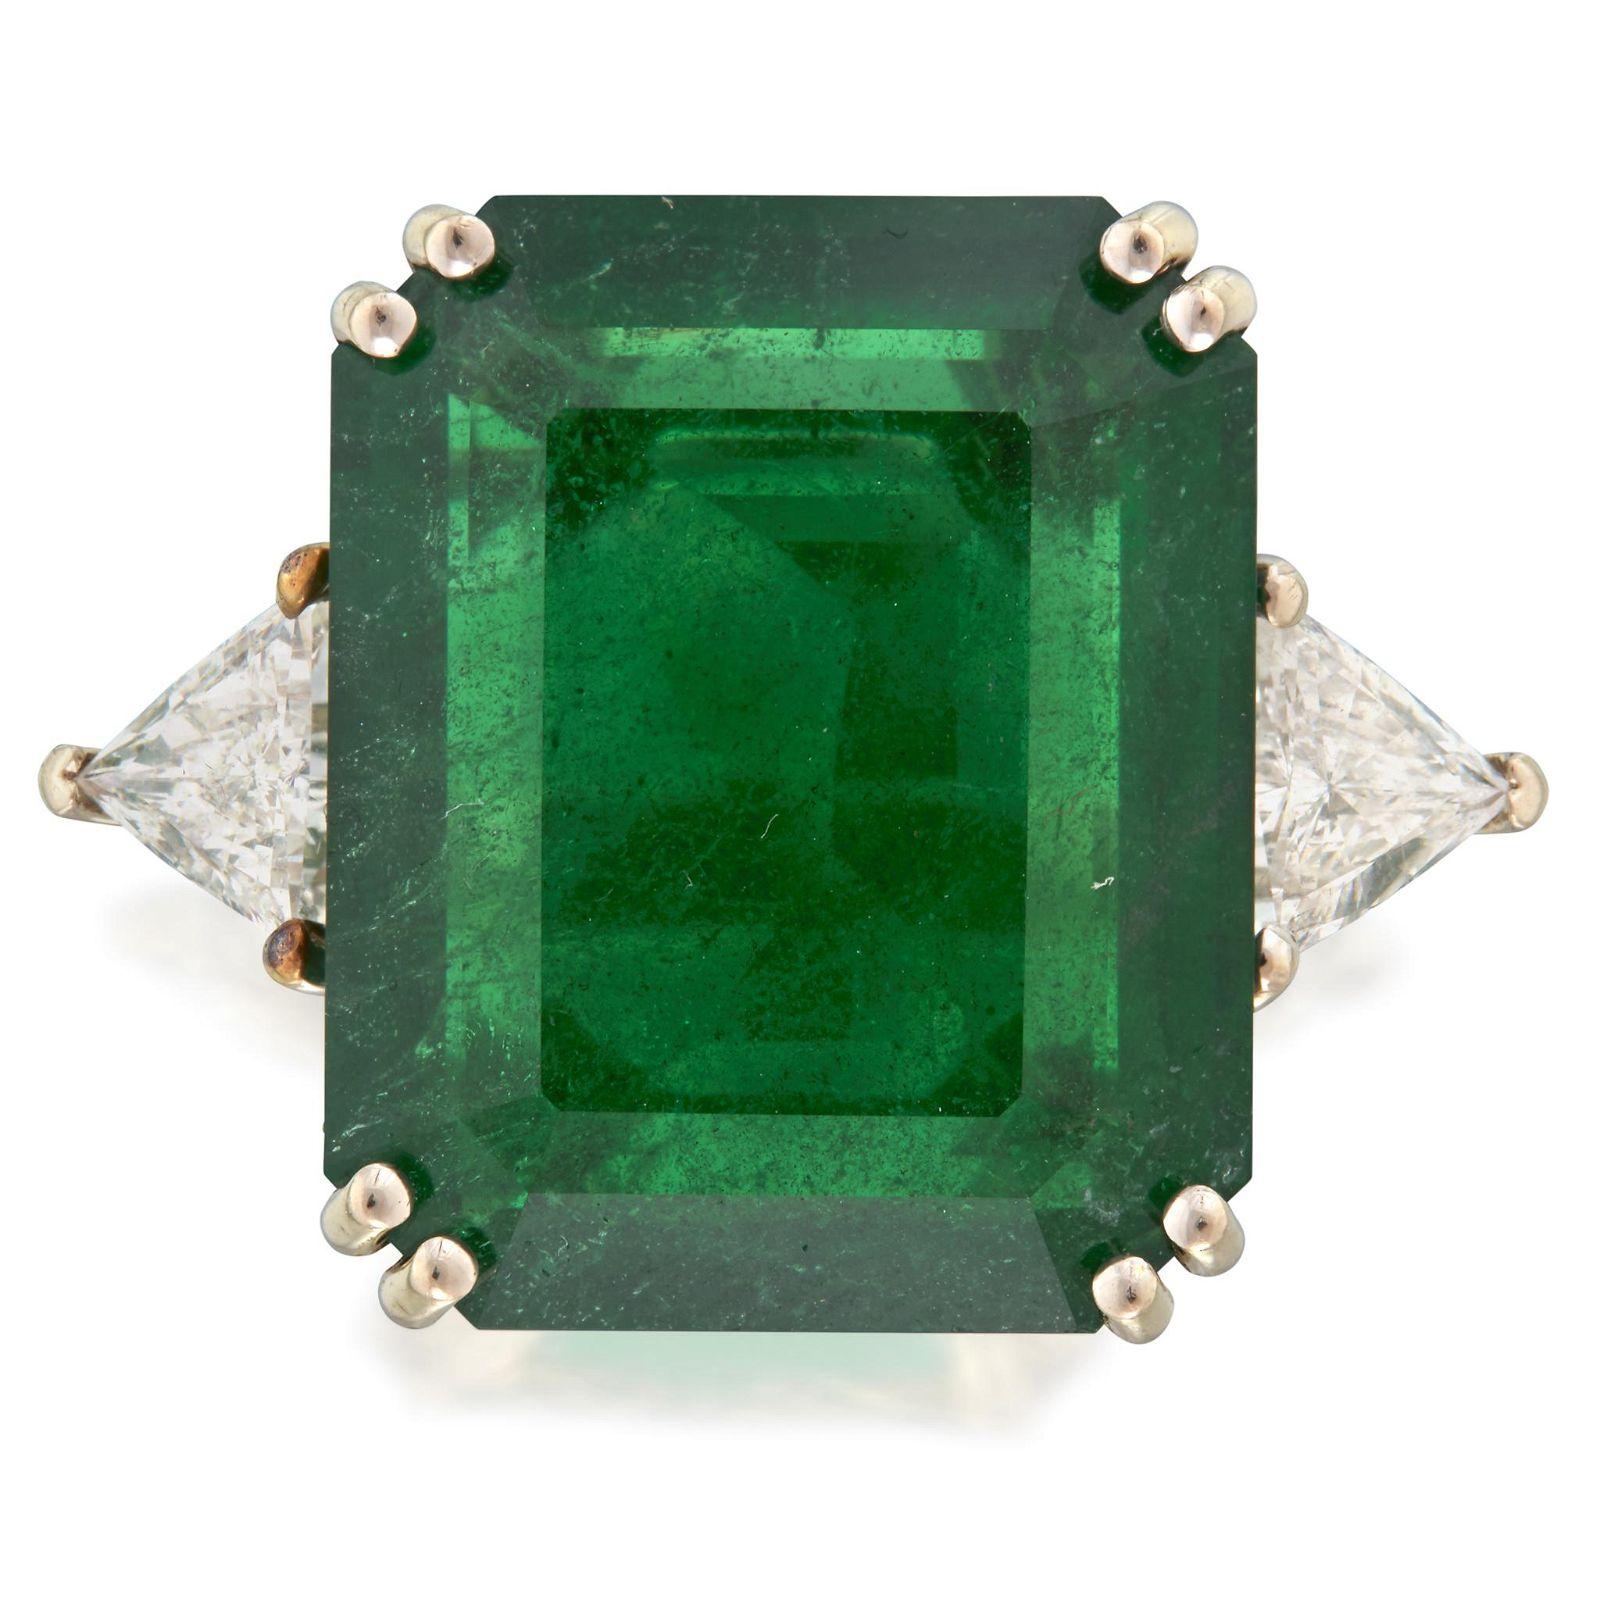 An emerald, diamond, and fourteen karat white gold